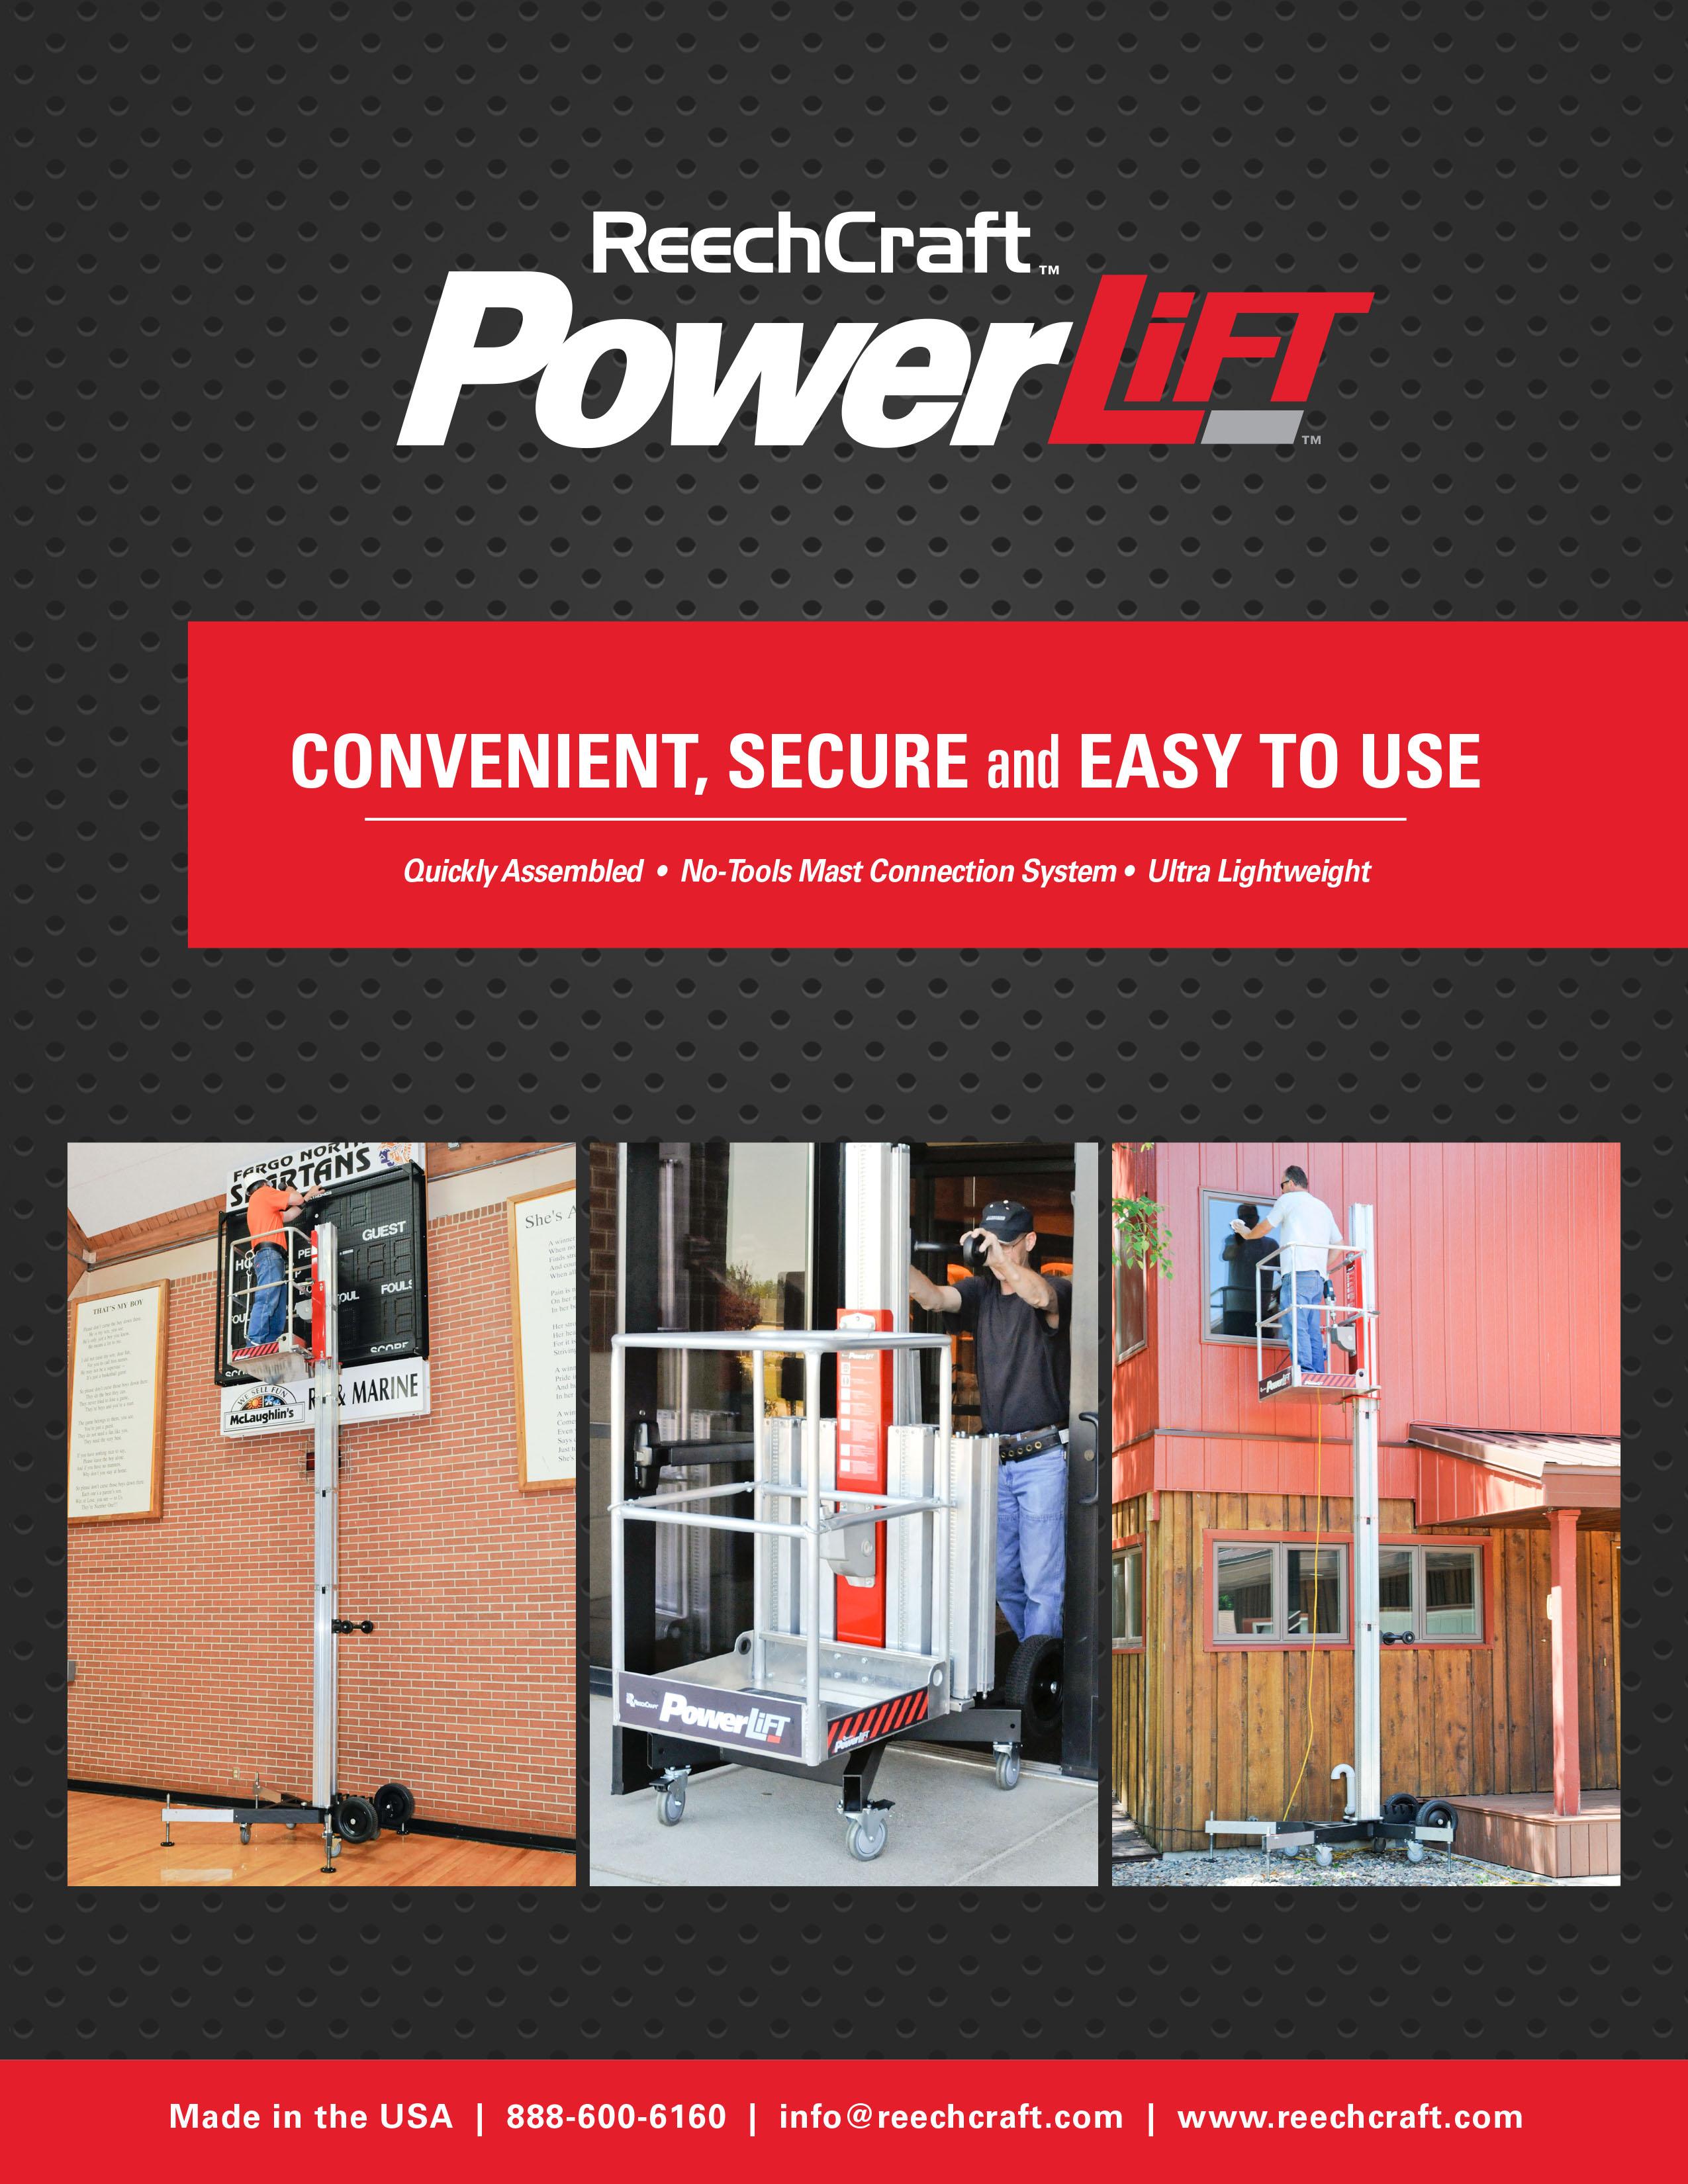 powerlift-brochure-1.jpg